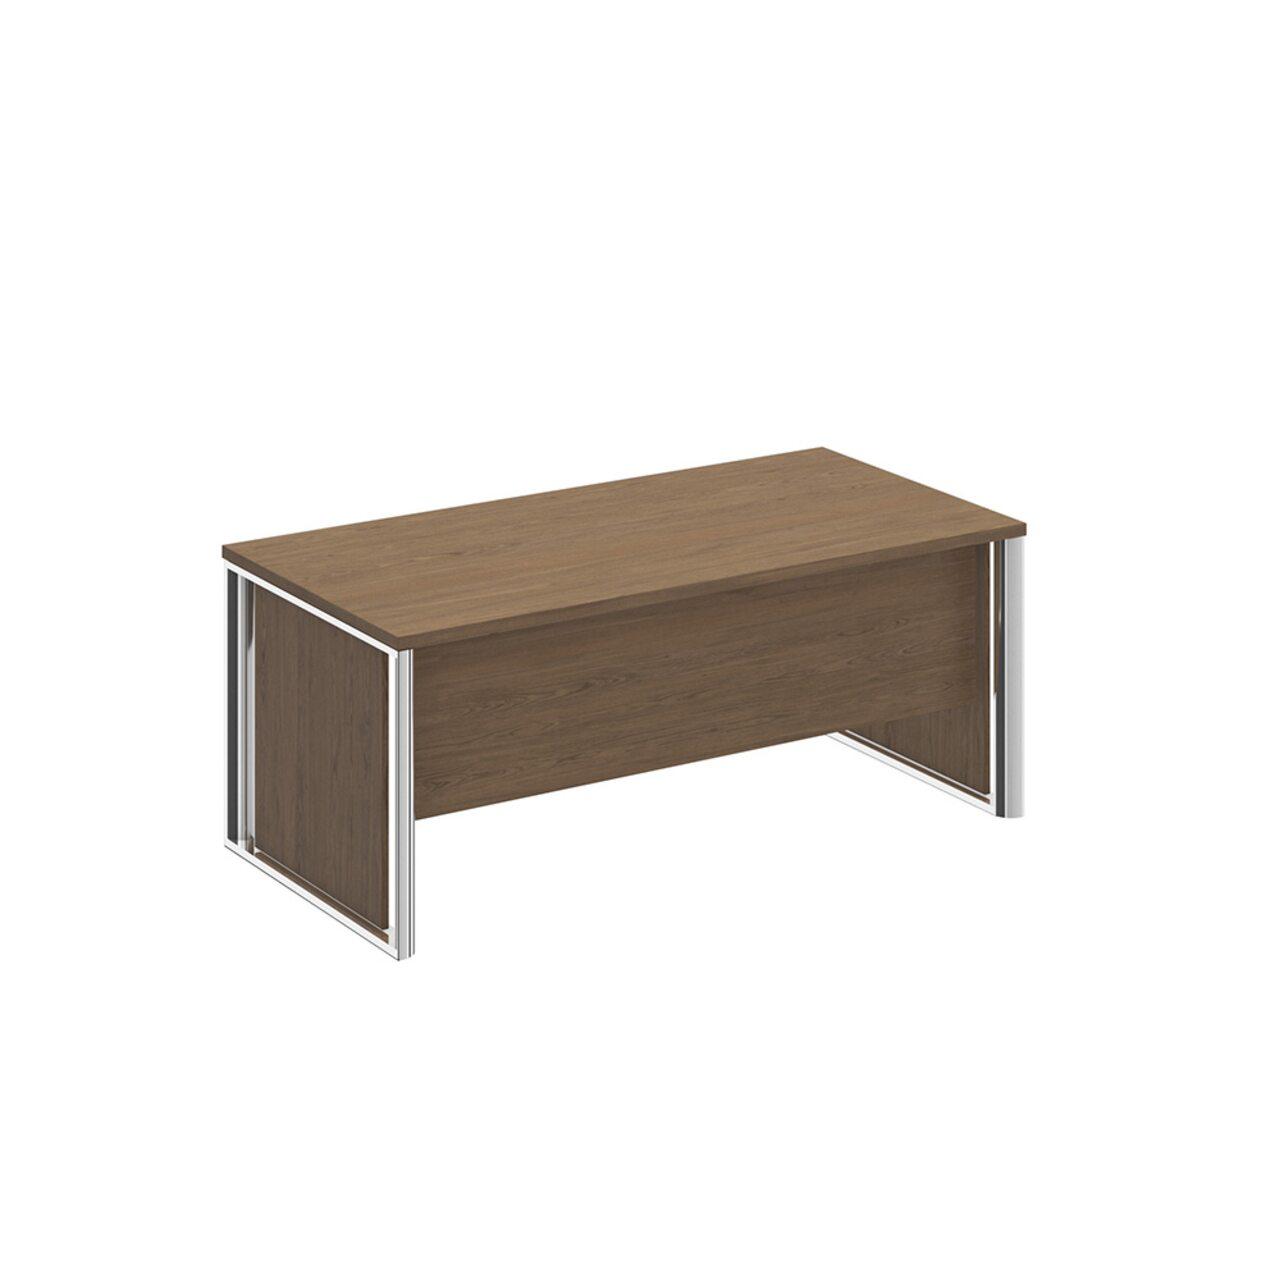 Стол руководителя с декоративными вставками  ORION 180x90x75 - фото 1